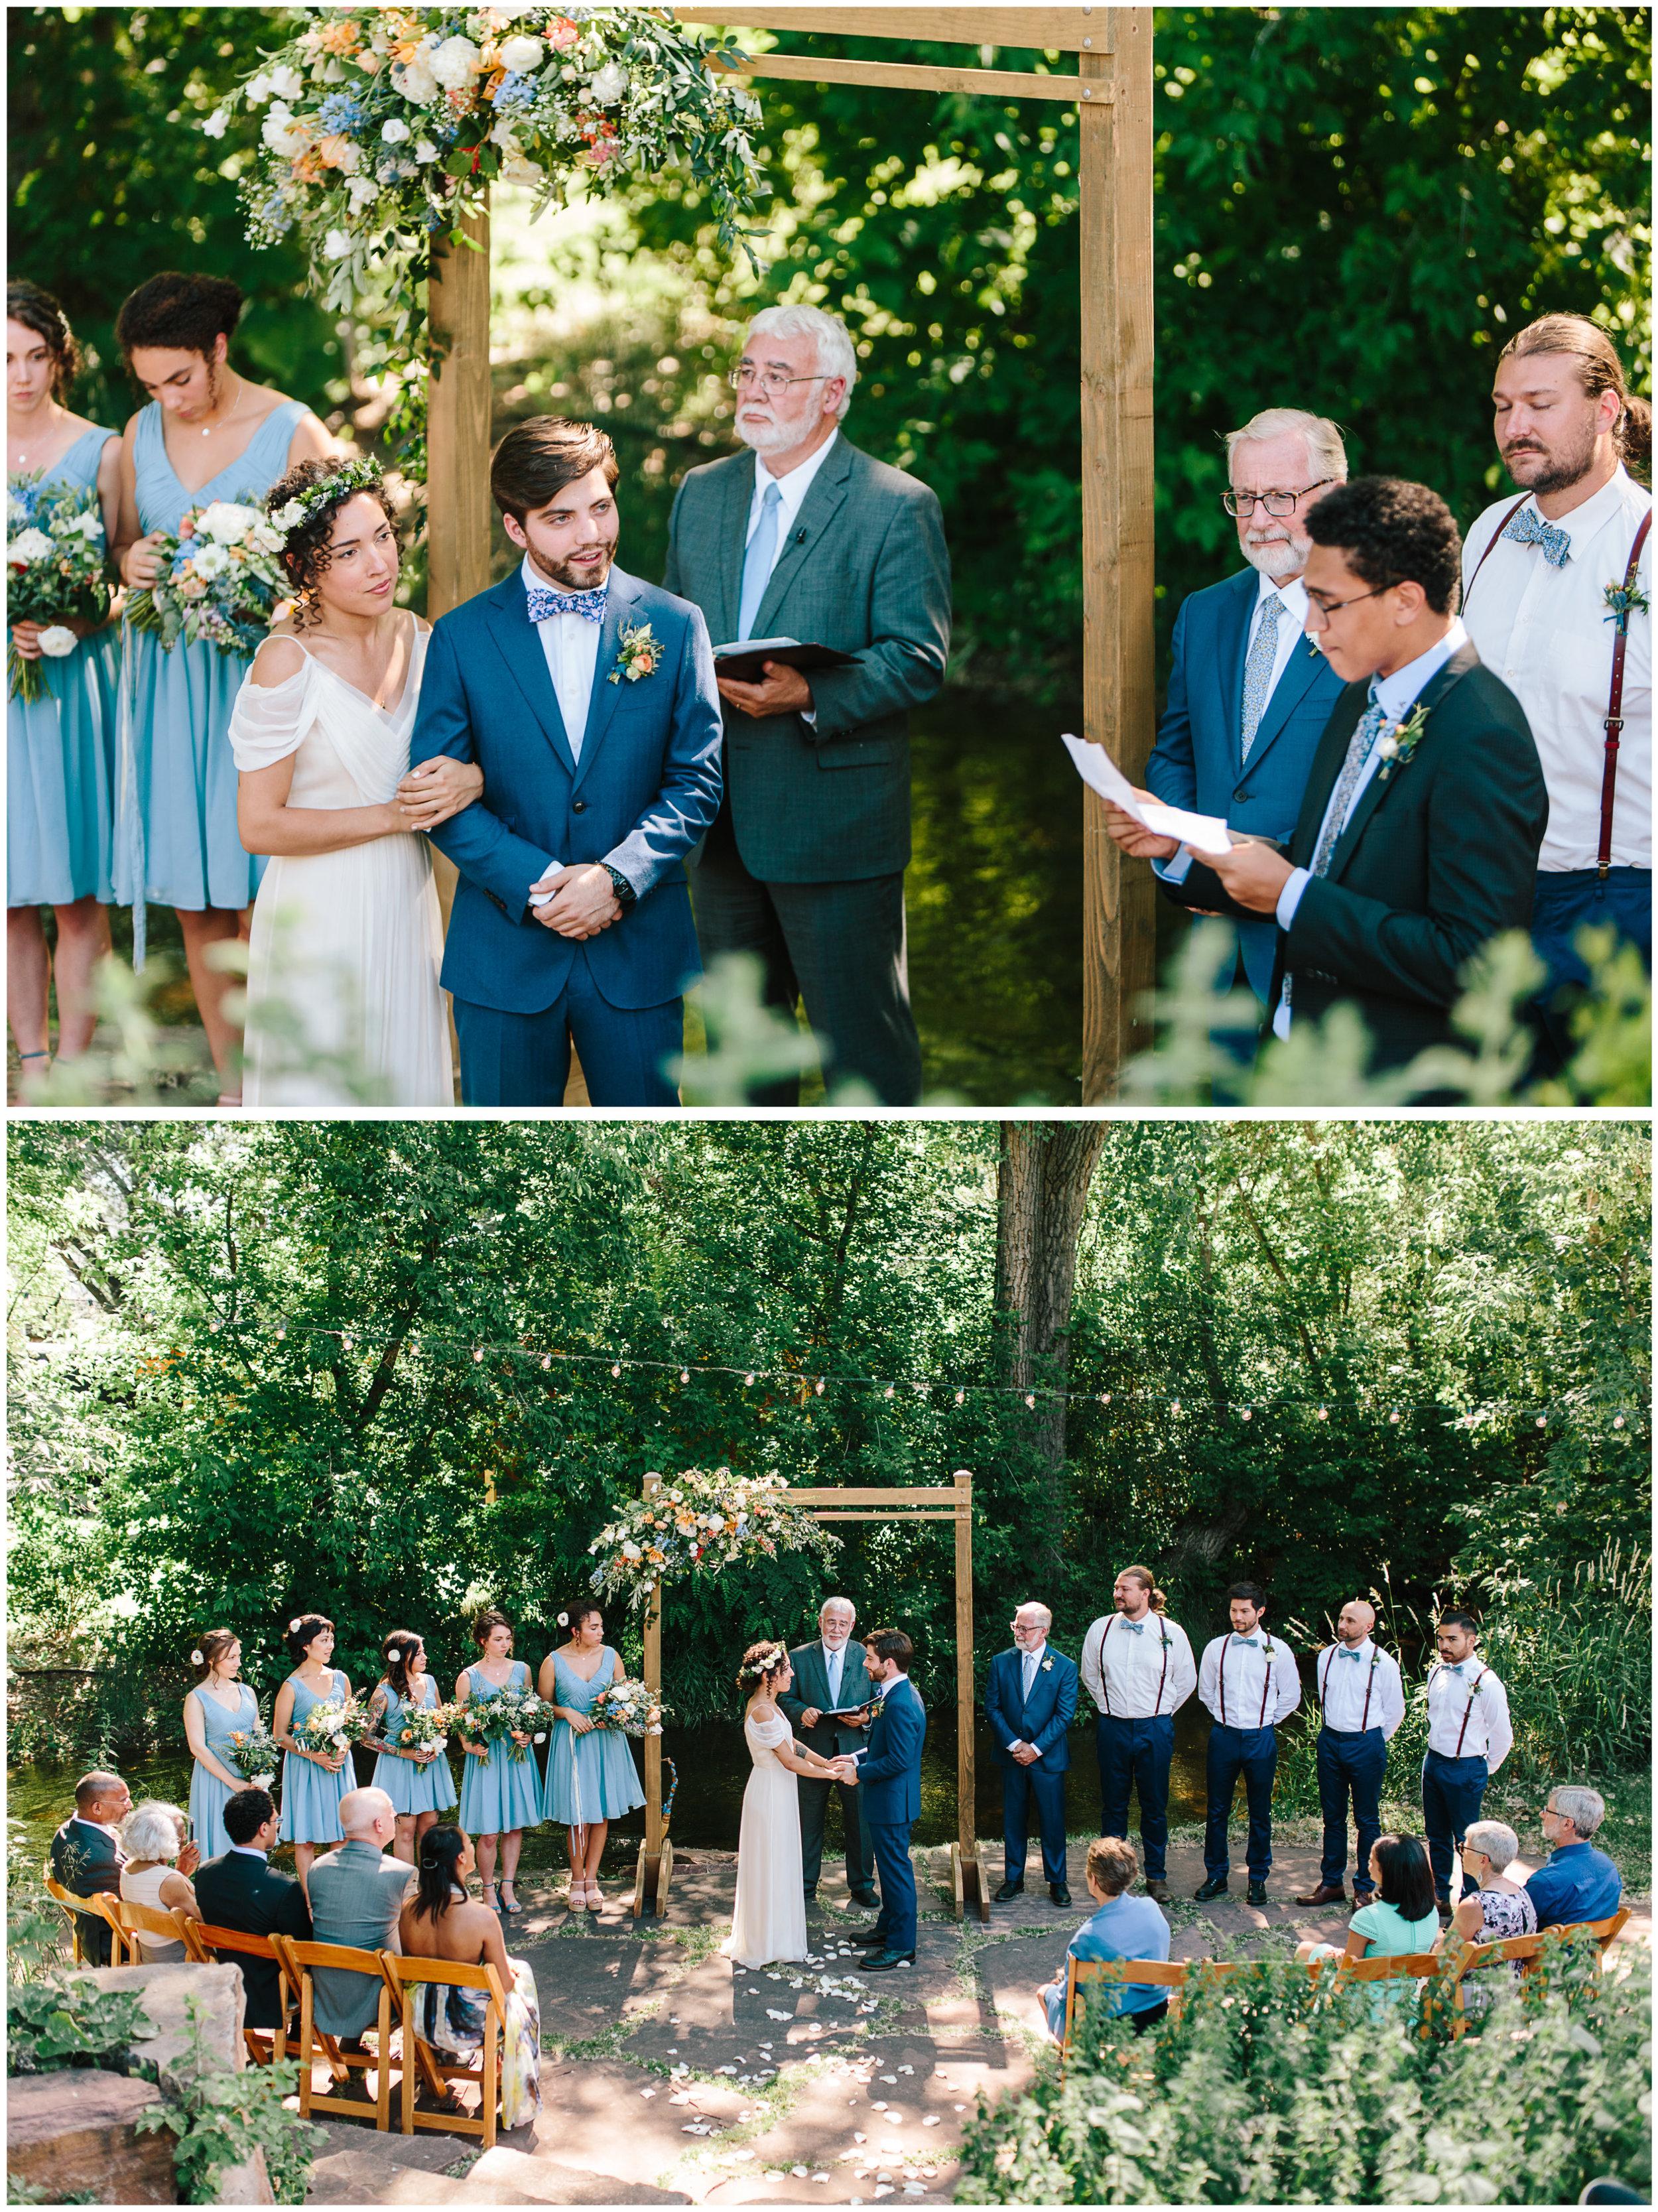 lyons_colorado_wedding_29.jpg